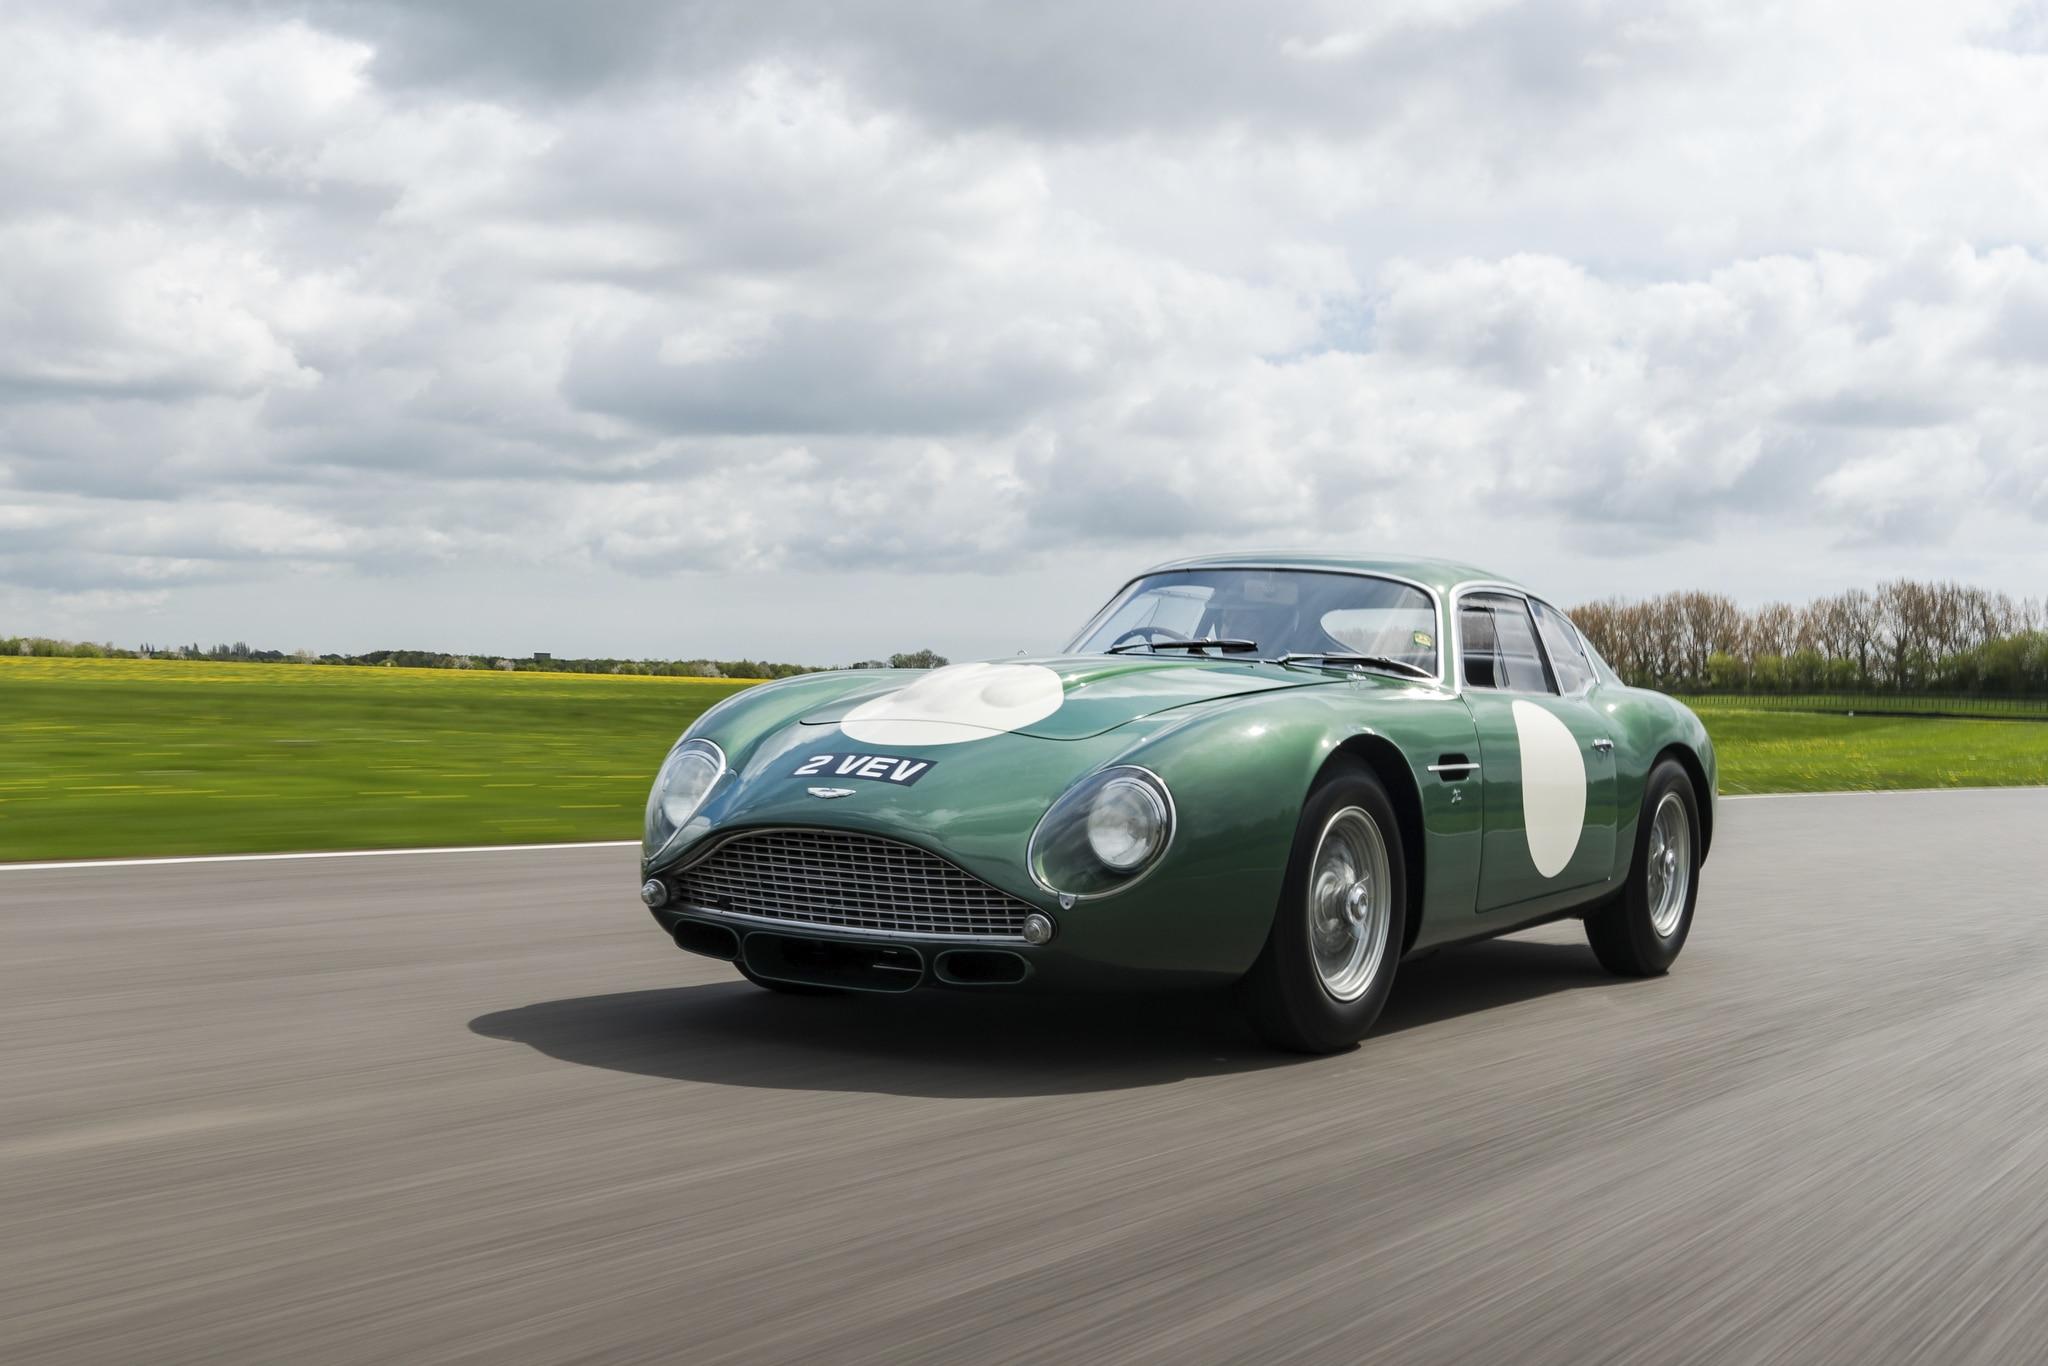 1961 Aston Martin Mp209 Db4gt Zagato Brings 13 302 239 In Record Breaking Bonhams Auction